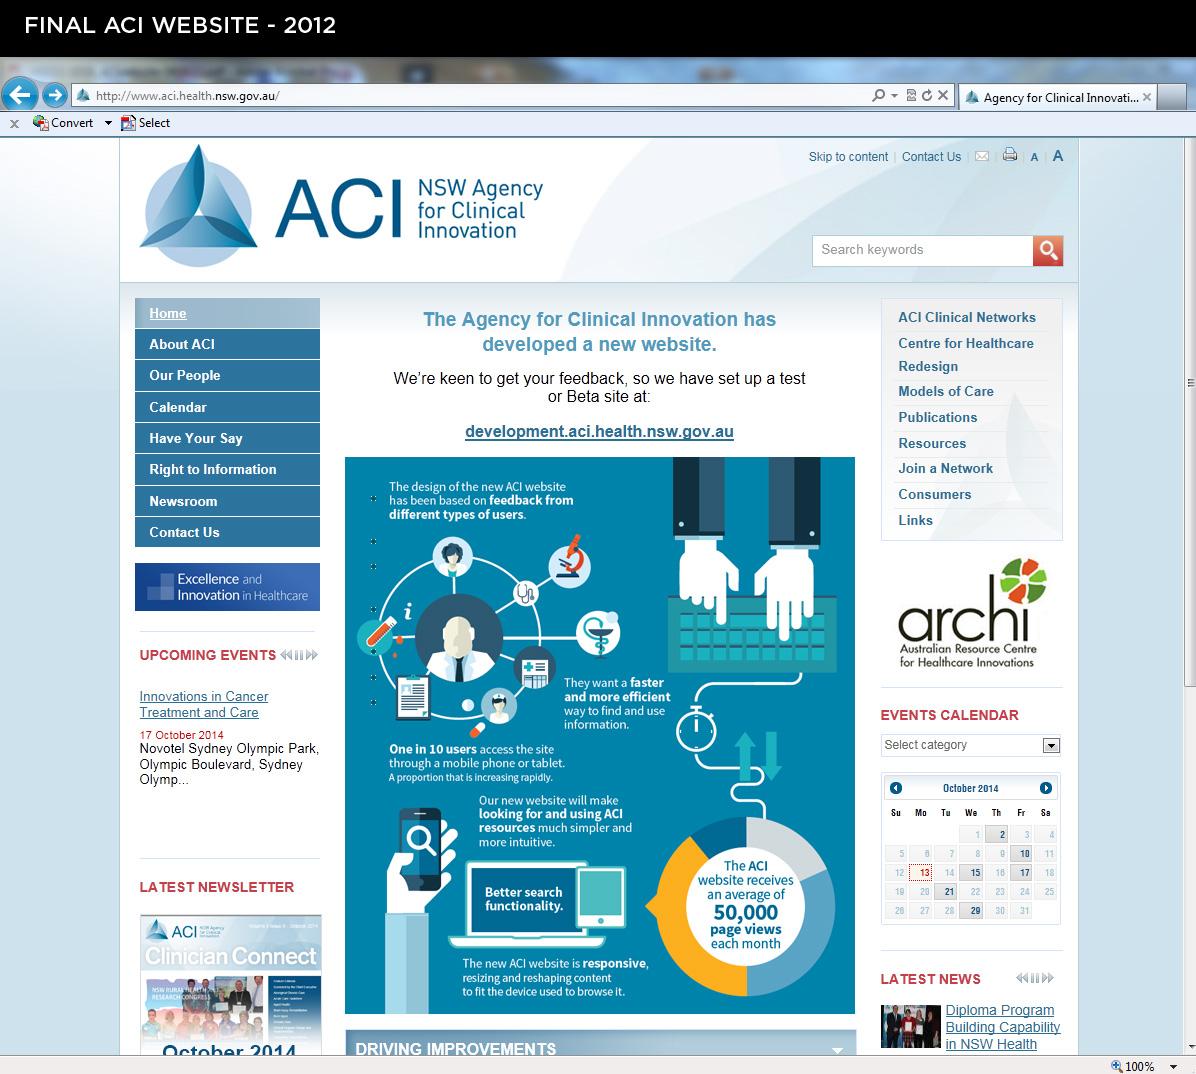 ACI Website - final 2012